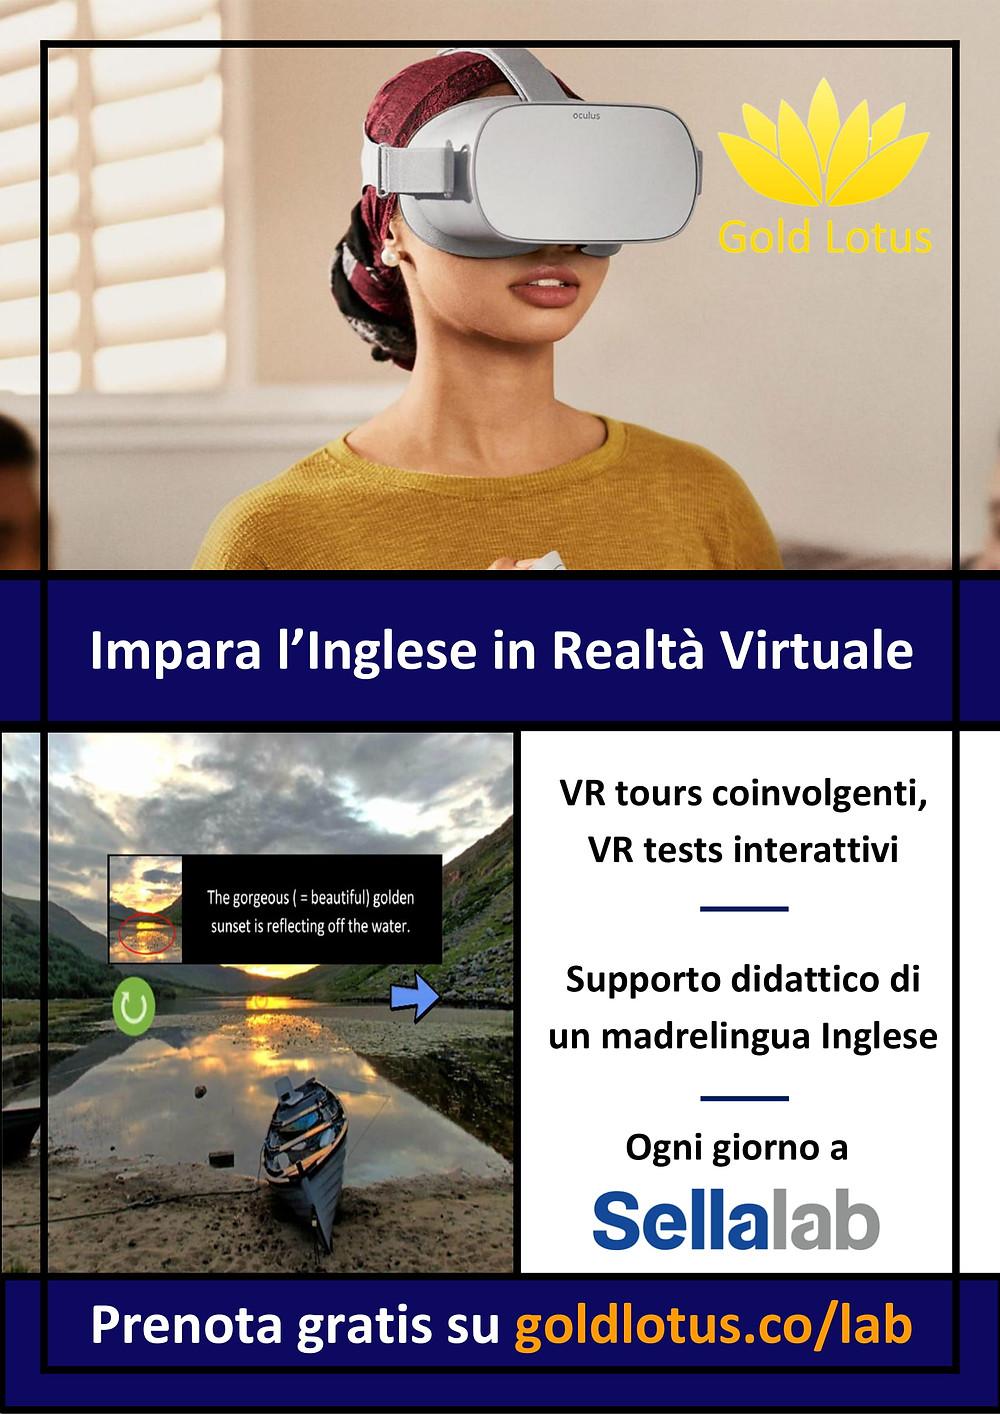 Impara l'inglese in realtà virtuale